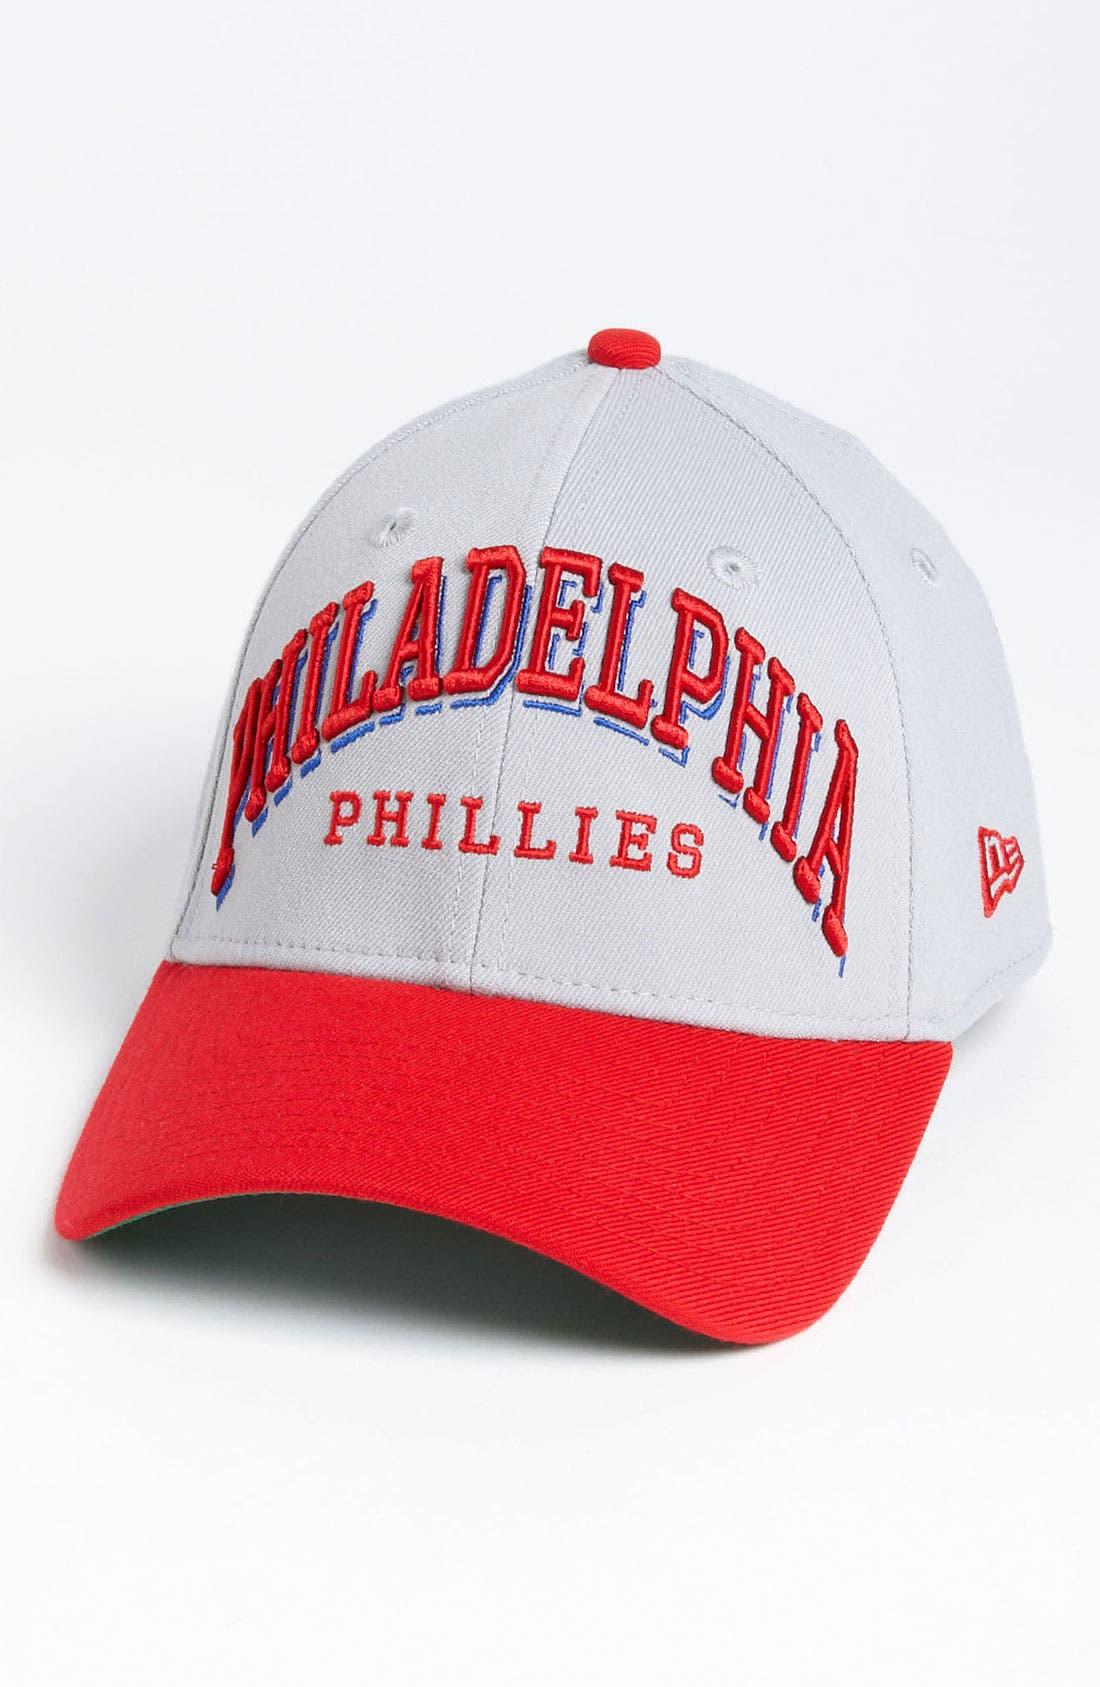 Alternate Image 1 Selected - New Era Cap 'Philadelphia Phillies - Arch Mark' Fitted Baseball Cap